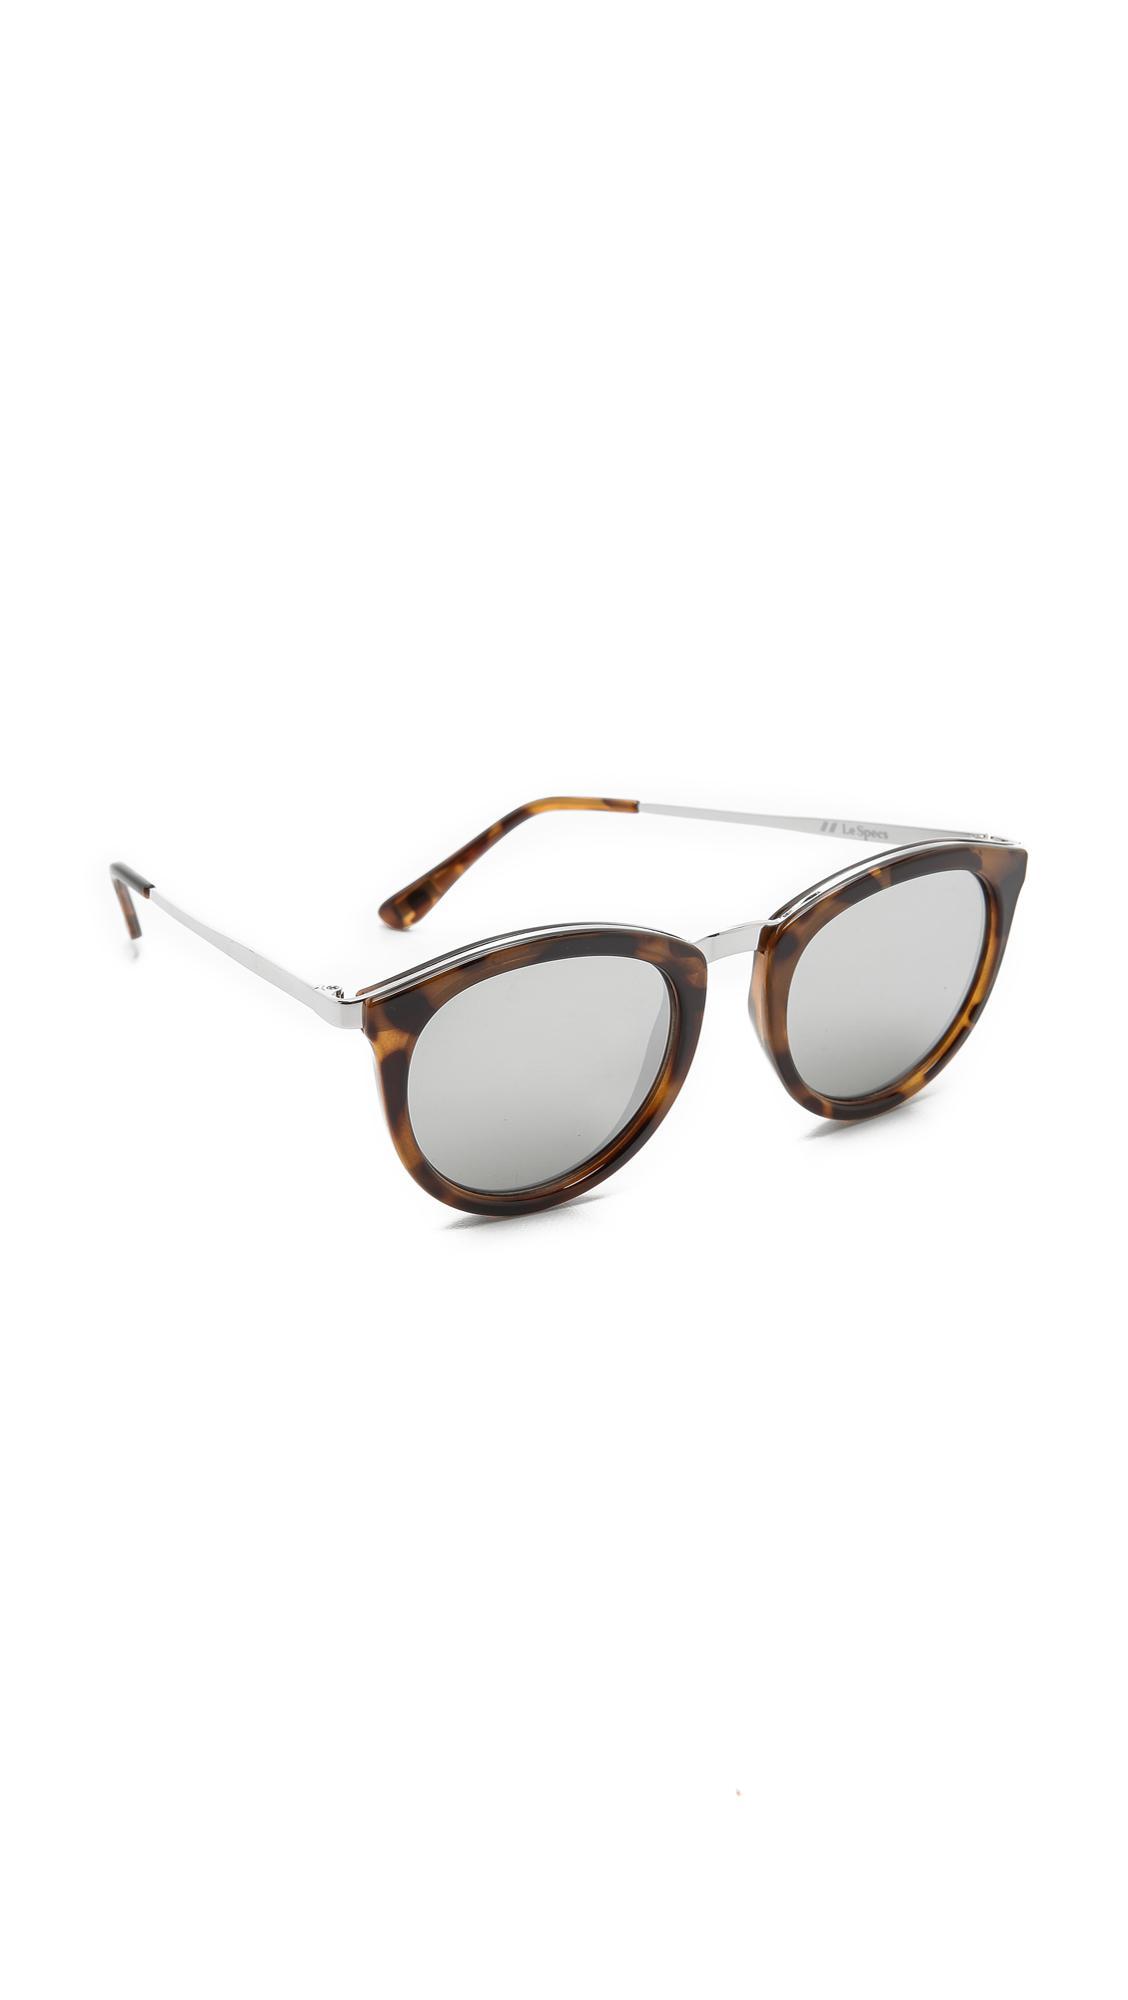 eed898c5aa Le Specs No Smirking Sunglasses in Metallic - Lyst